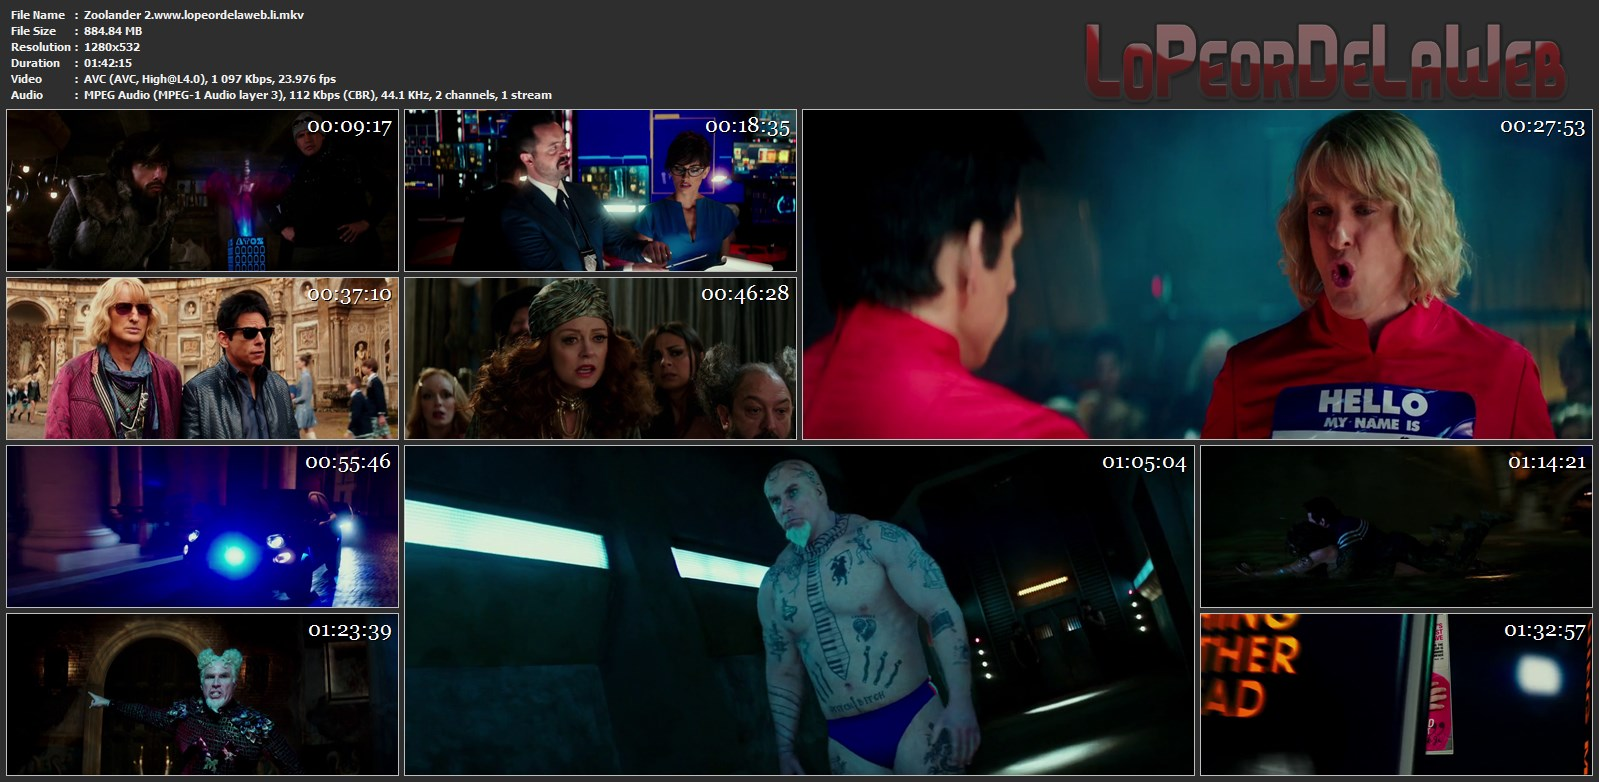 Zoolander 2 720p Latino (2016) [Mega - Uptobox]